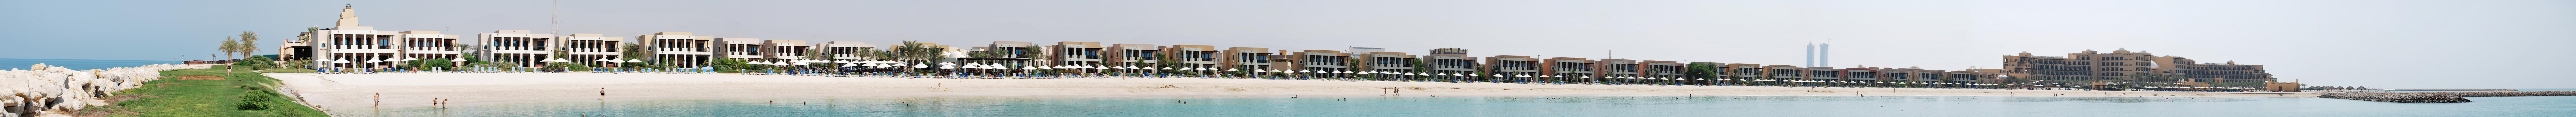 Hilton Resort Ra's al-Chaima (VAE)